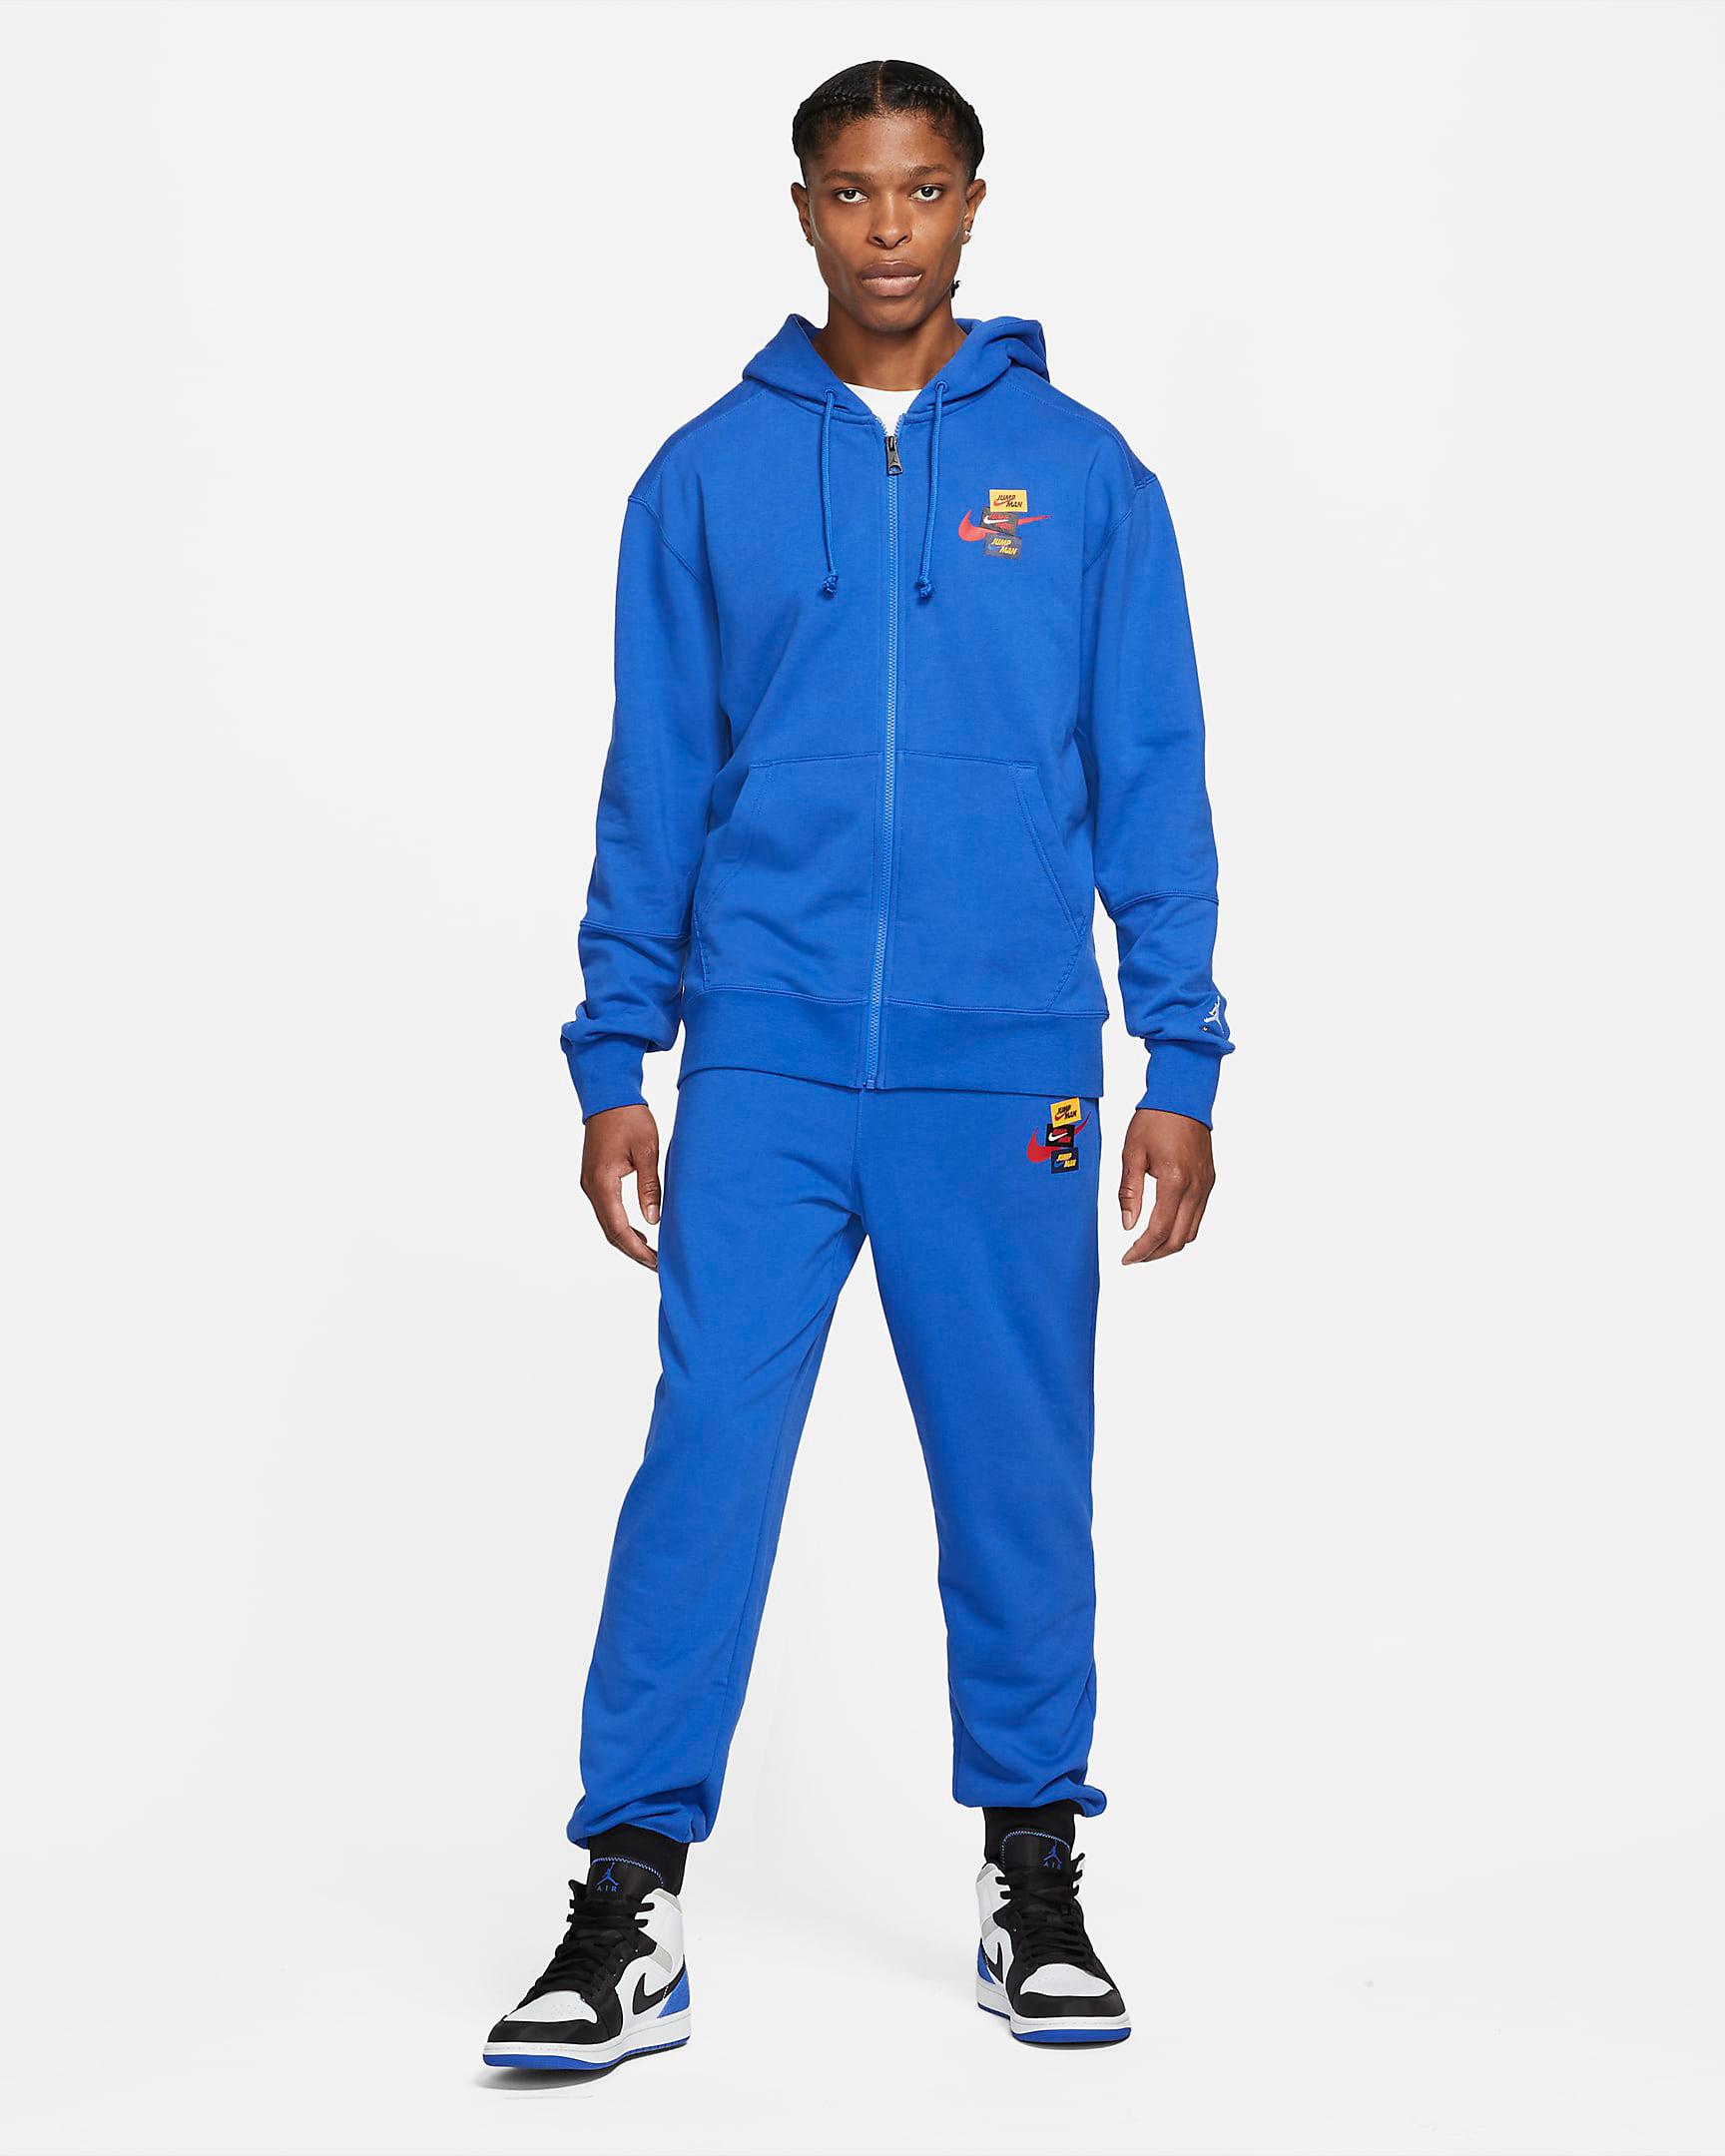 jordan-game-royal-jumpman-hoodie-pants-outfit